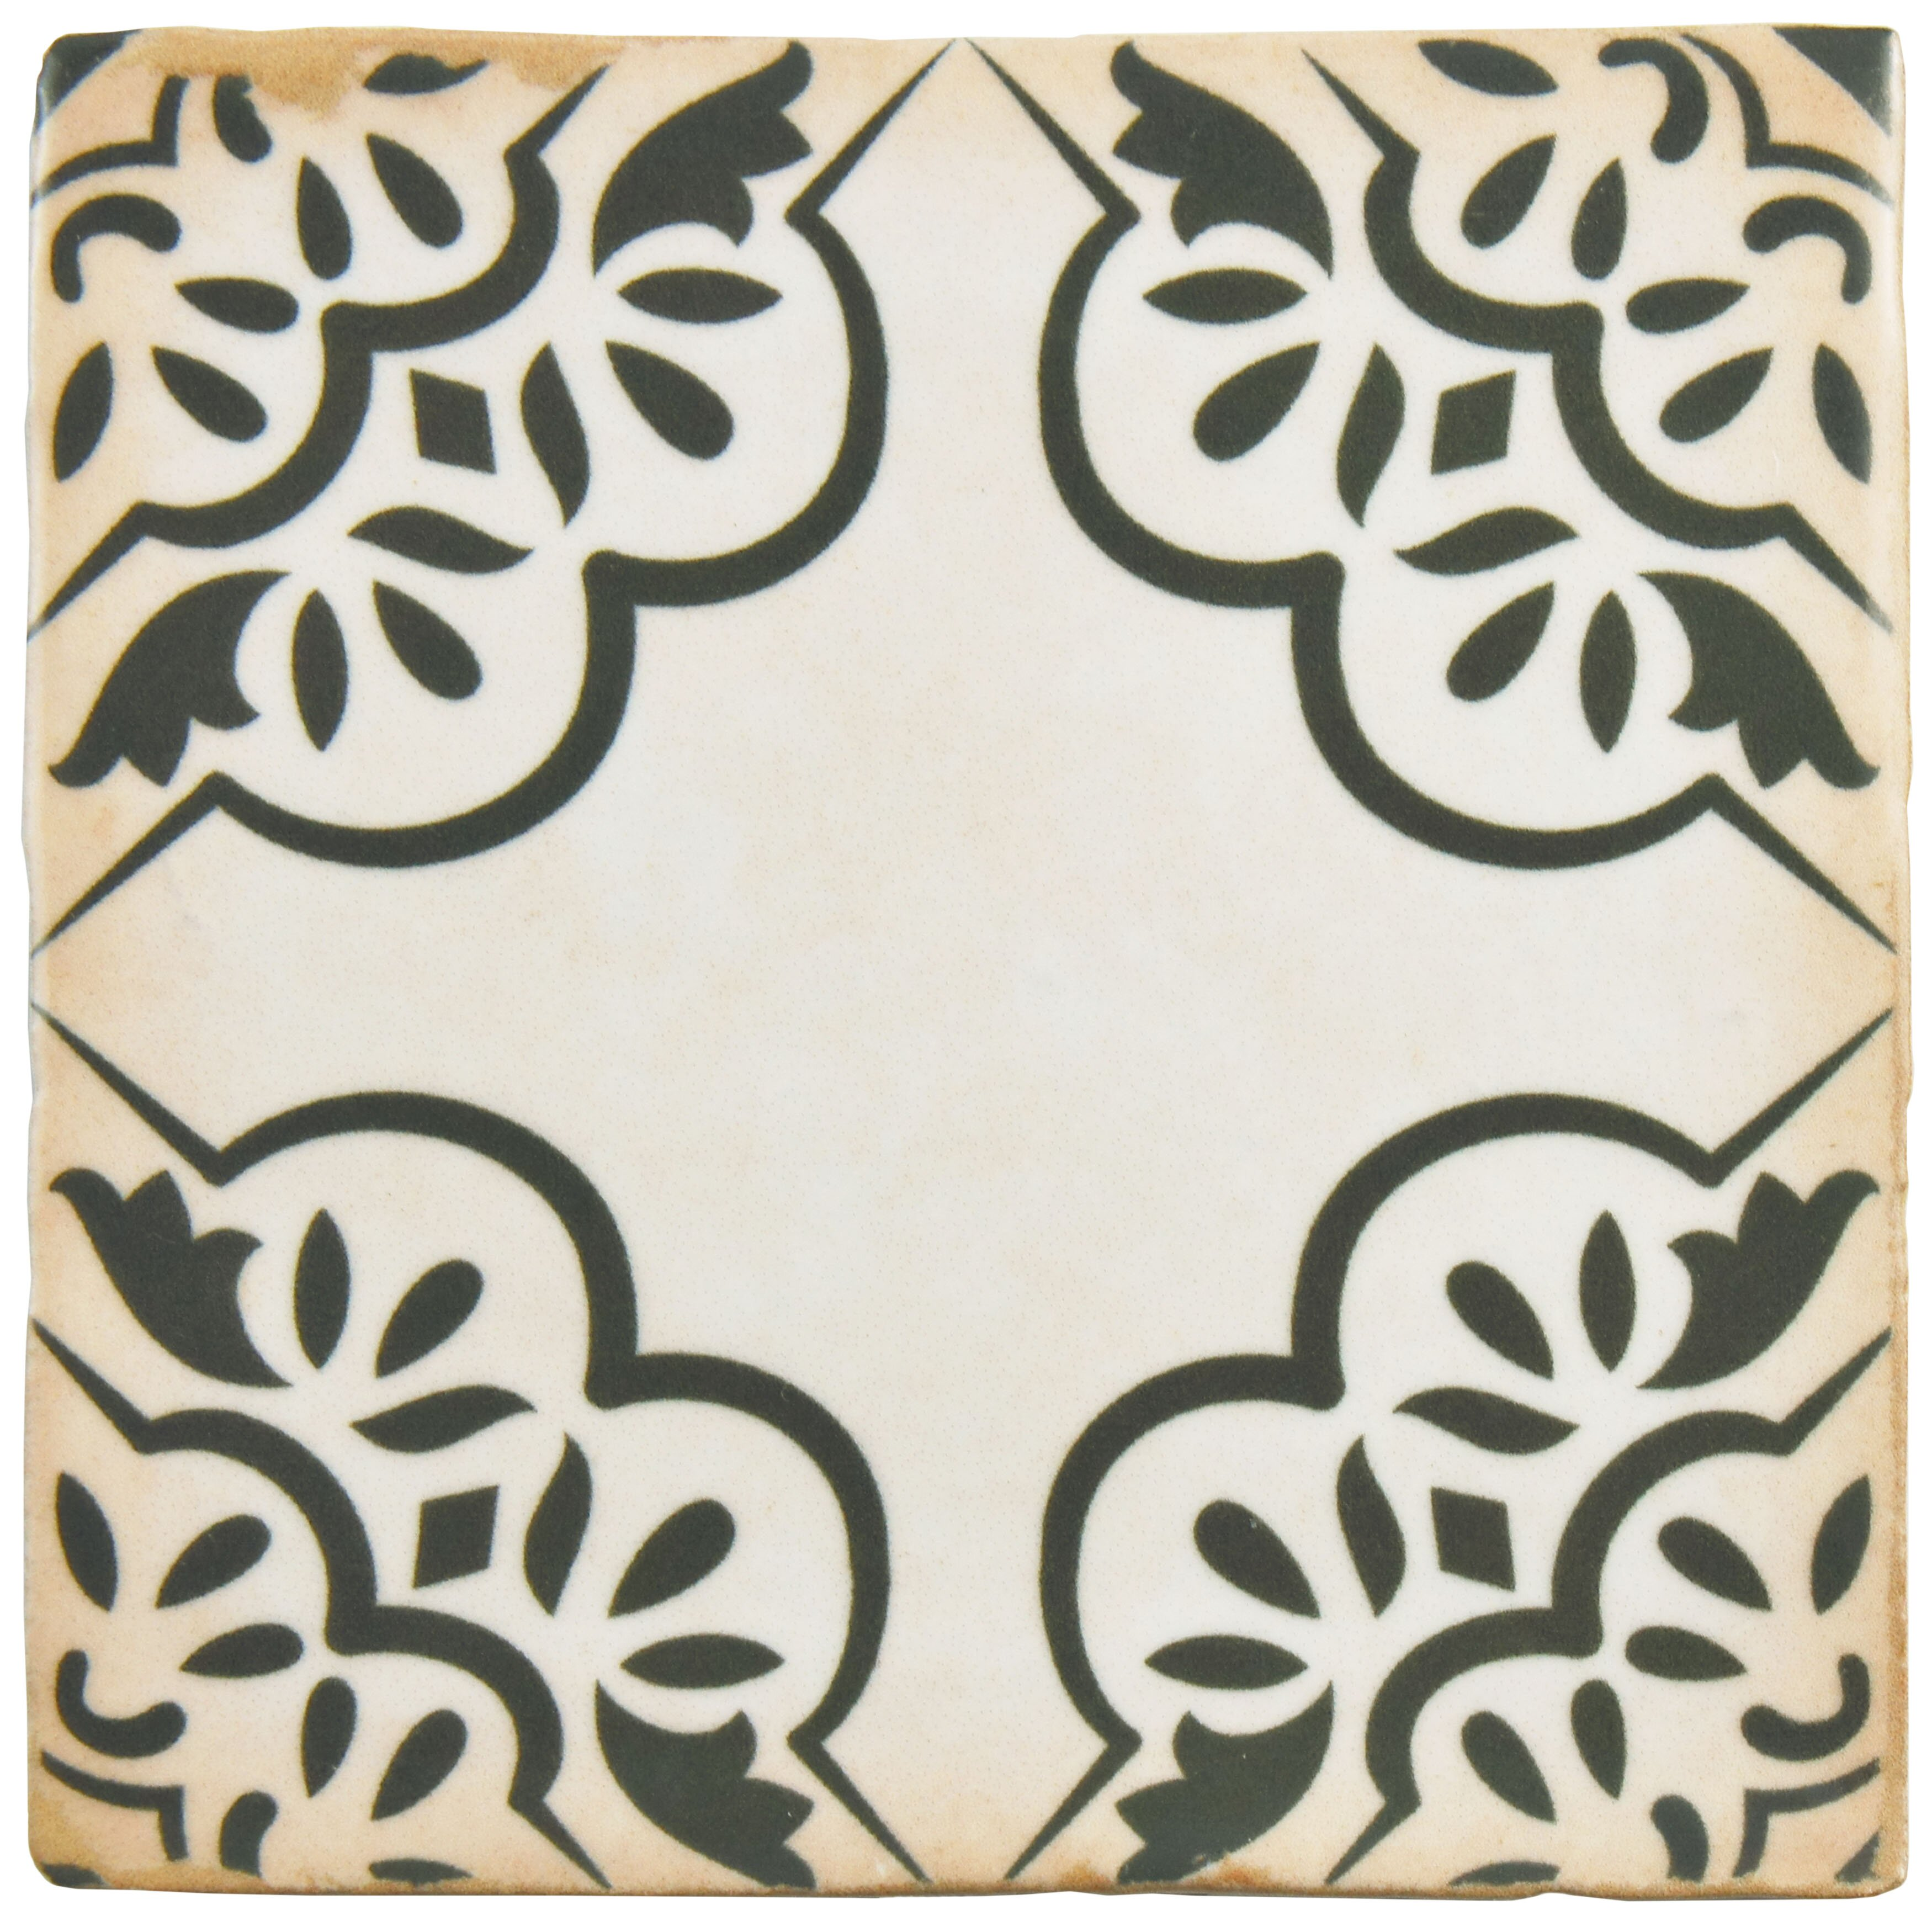 Elitetile arquivo x ceramic field tile in ornate reviews wayfair - Fliesen scheld ...